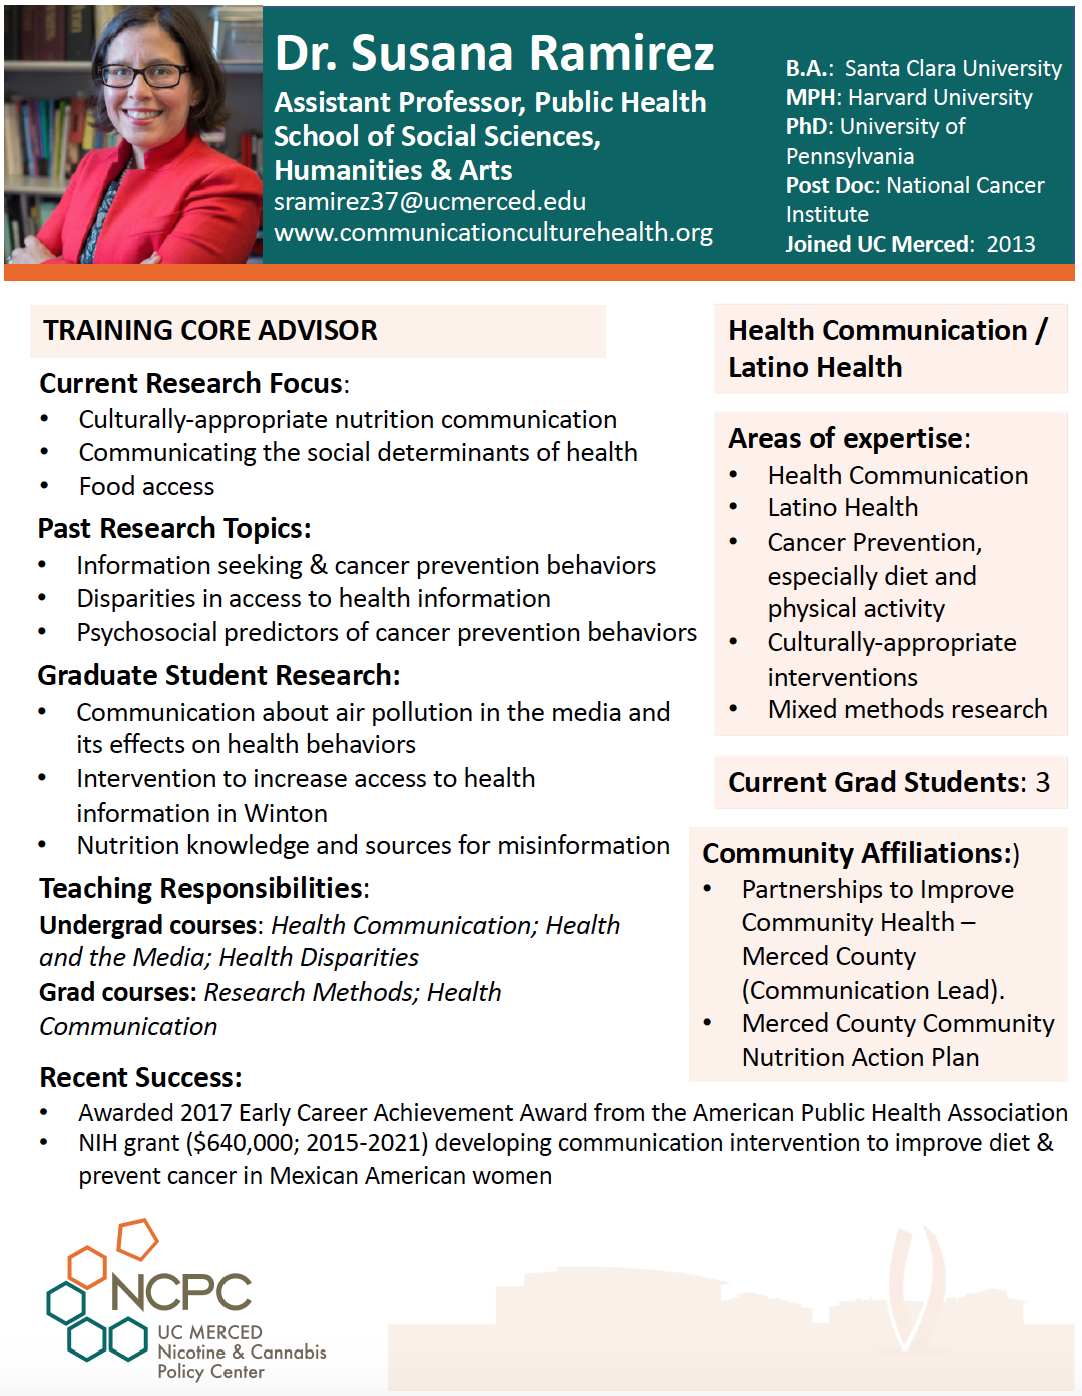 Dr. Susana Ramirez Affiliate Researcher